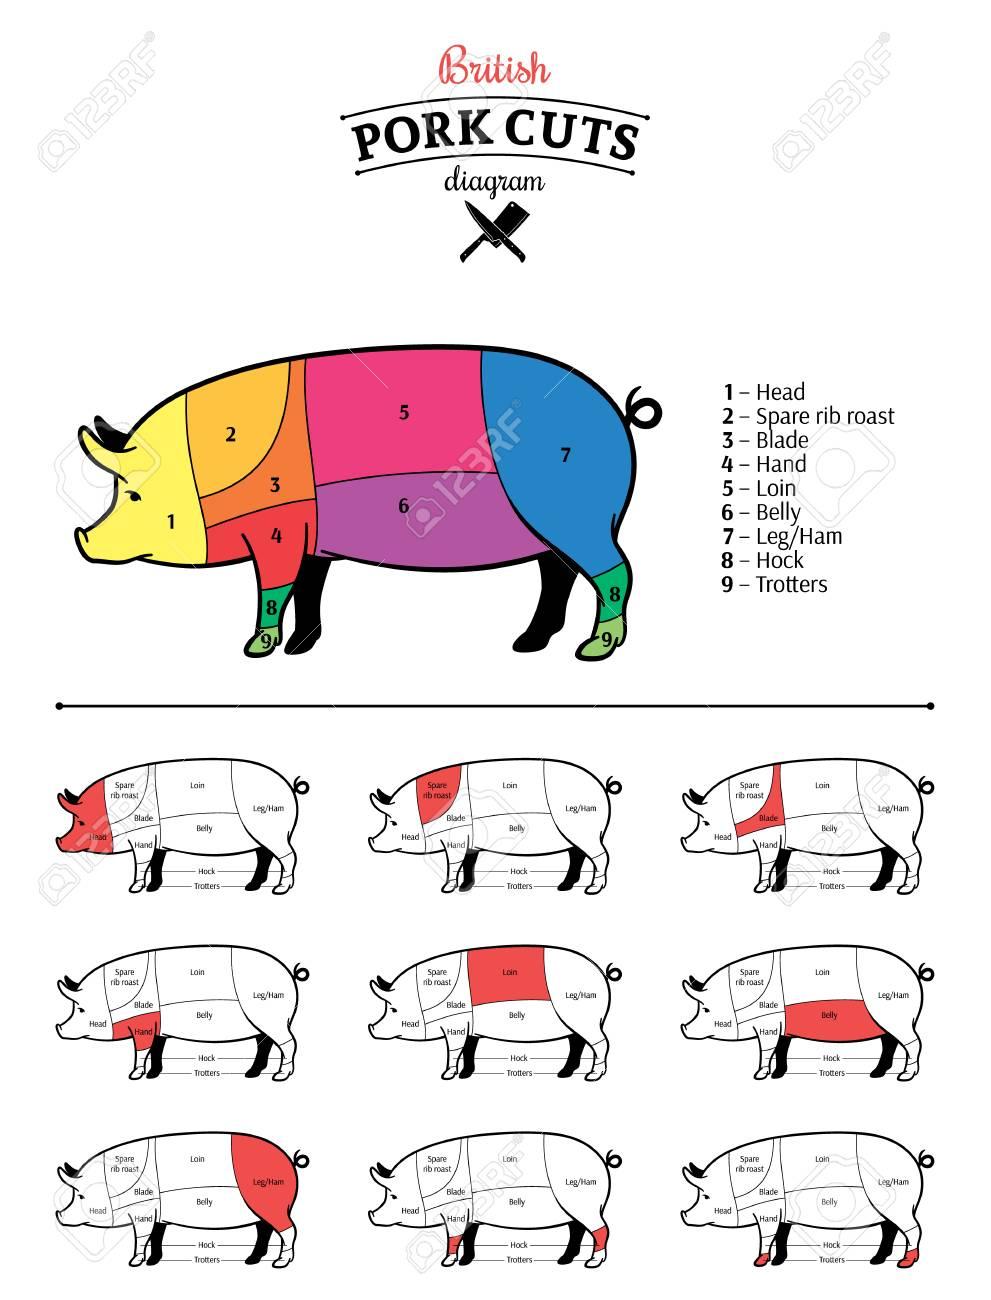 medium resolution of british pork cuts diagram stock vector 115010725